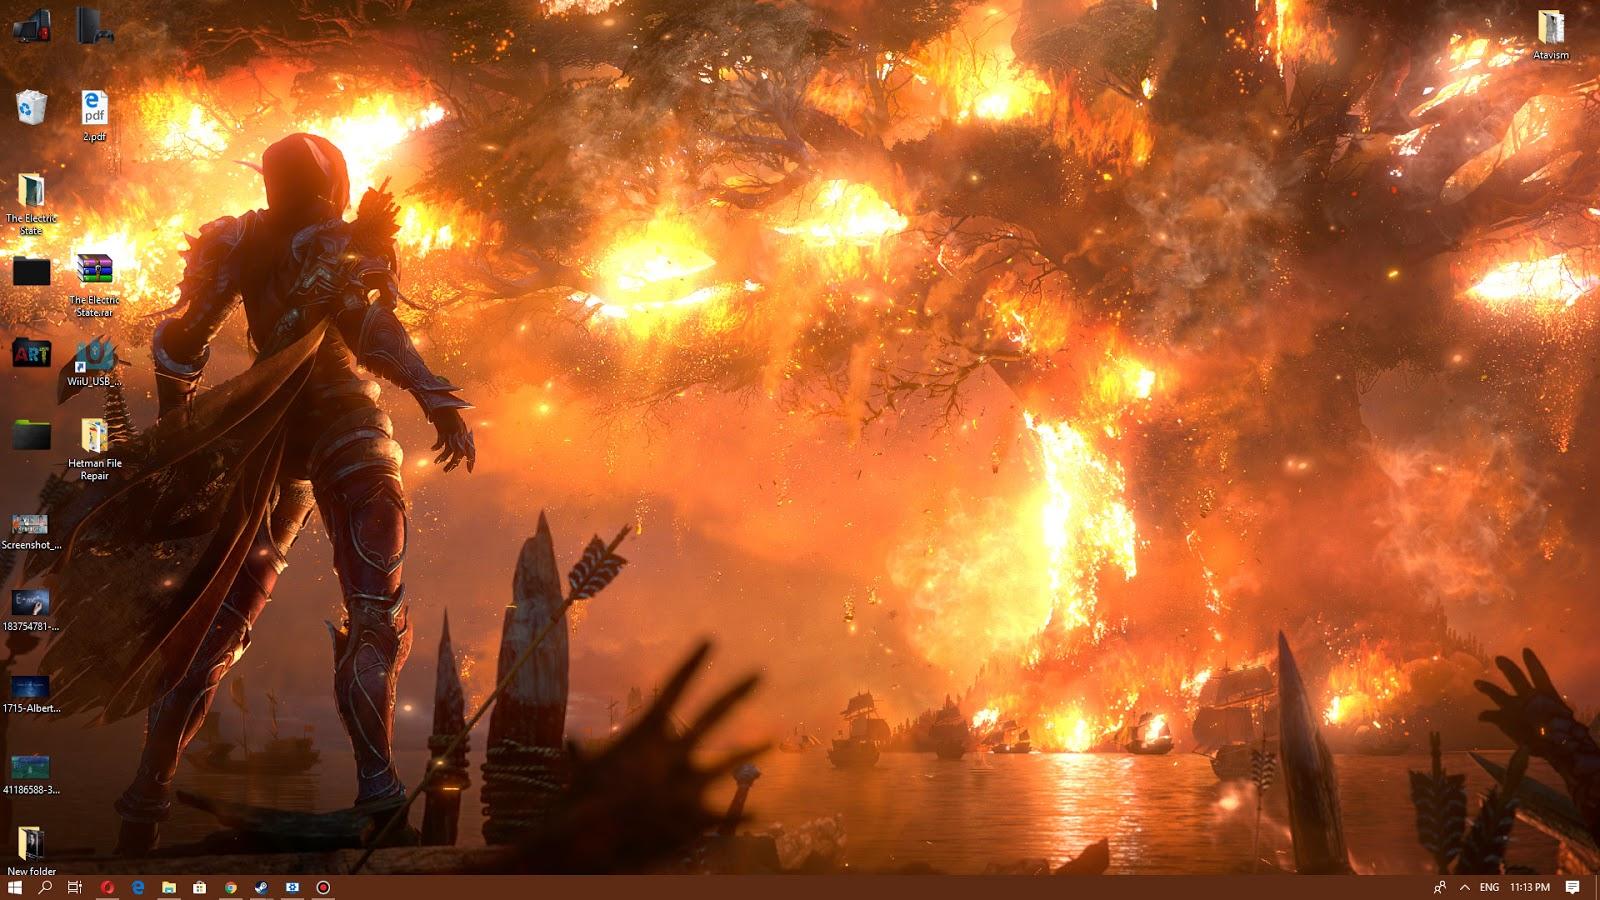 Anime 4k Wallpaper: Wallpaper Engine 4k World Of Warcraft Battle For Azeroth